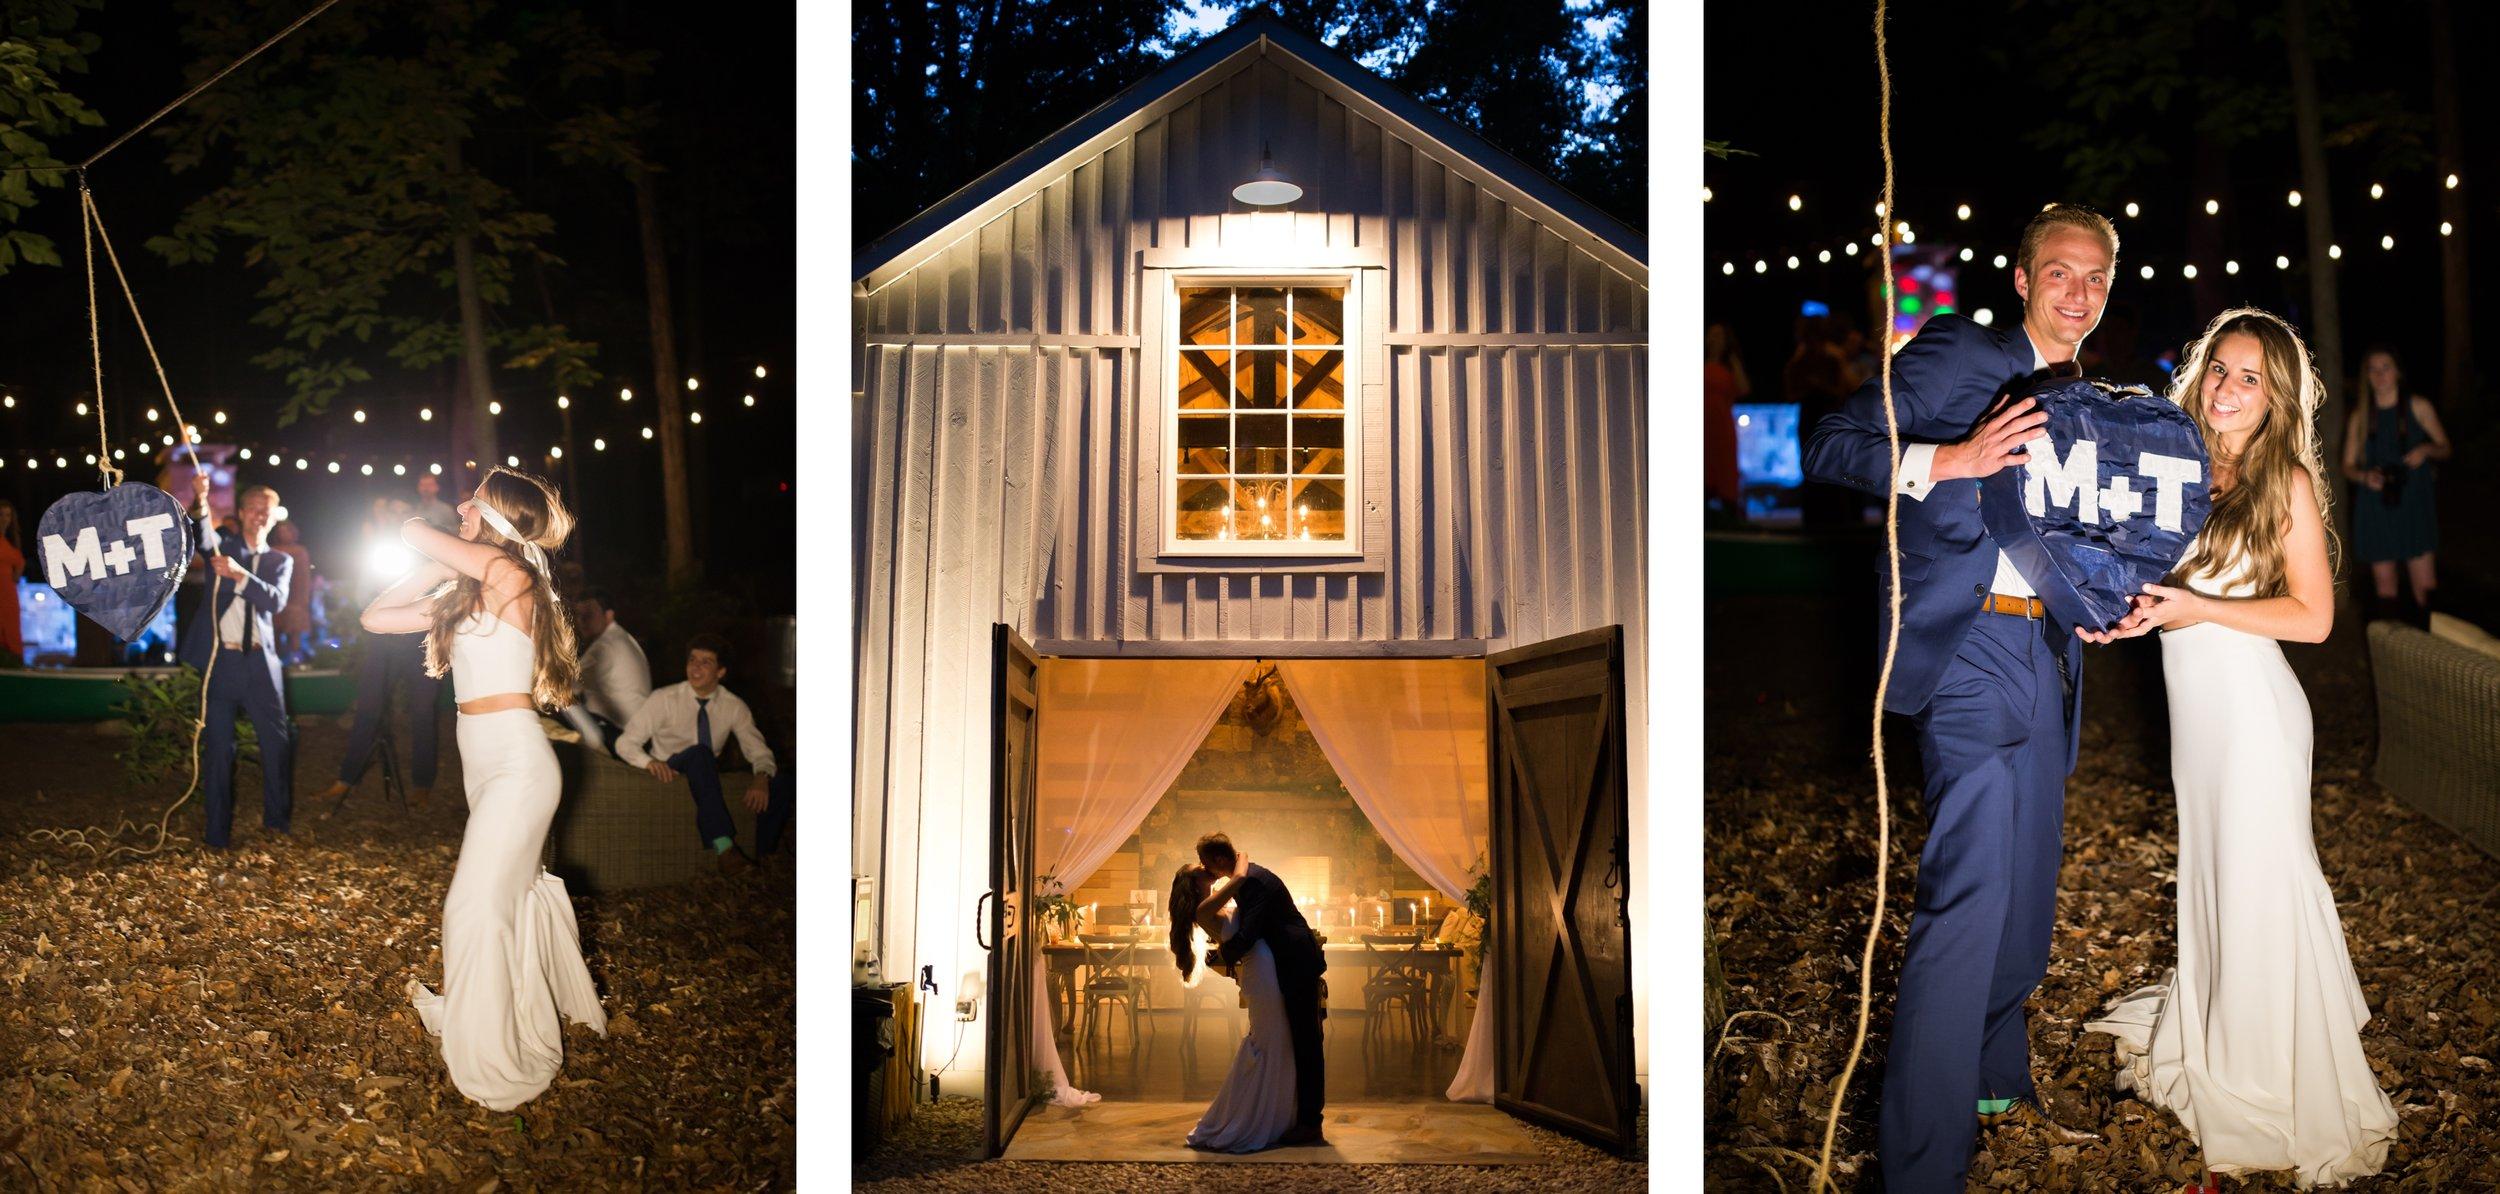 Rainey_Gregg_Photography_St._Simons_Island_Georgia_California_Wedding_Portrait_Photography_0191.jpg